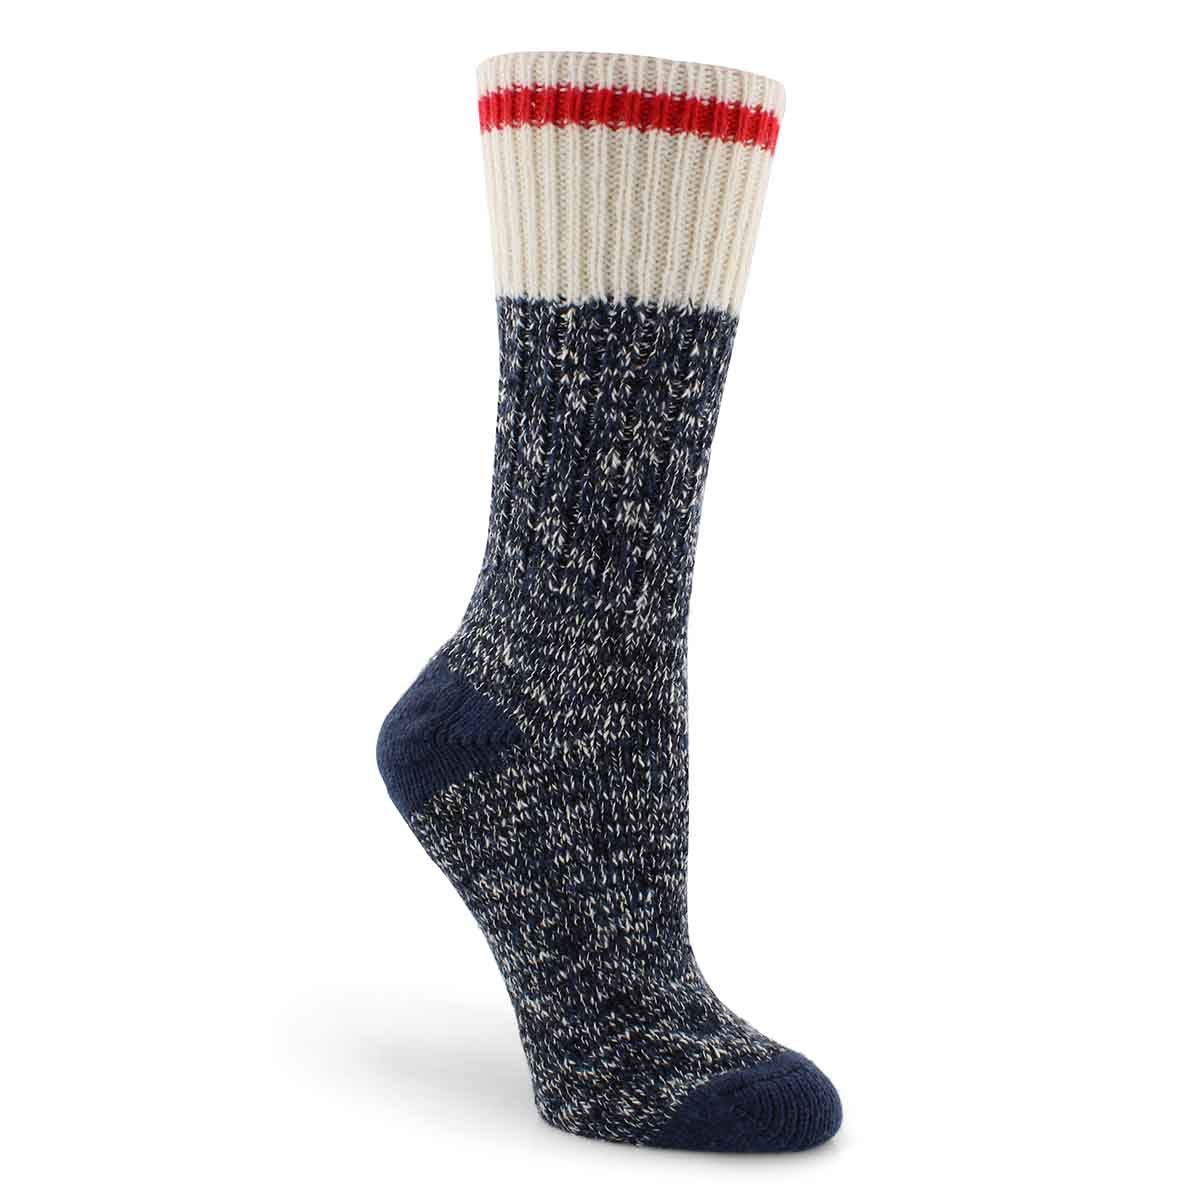 Women's Duray Work Sock - Blue Marled